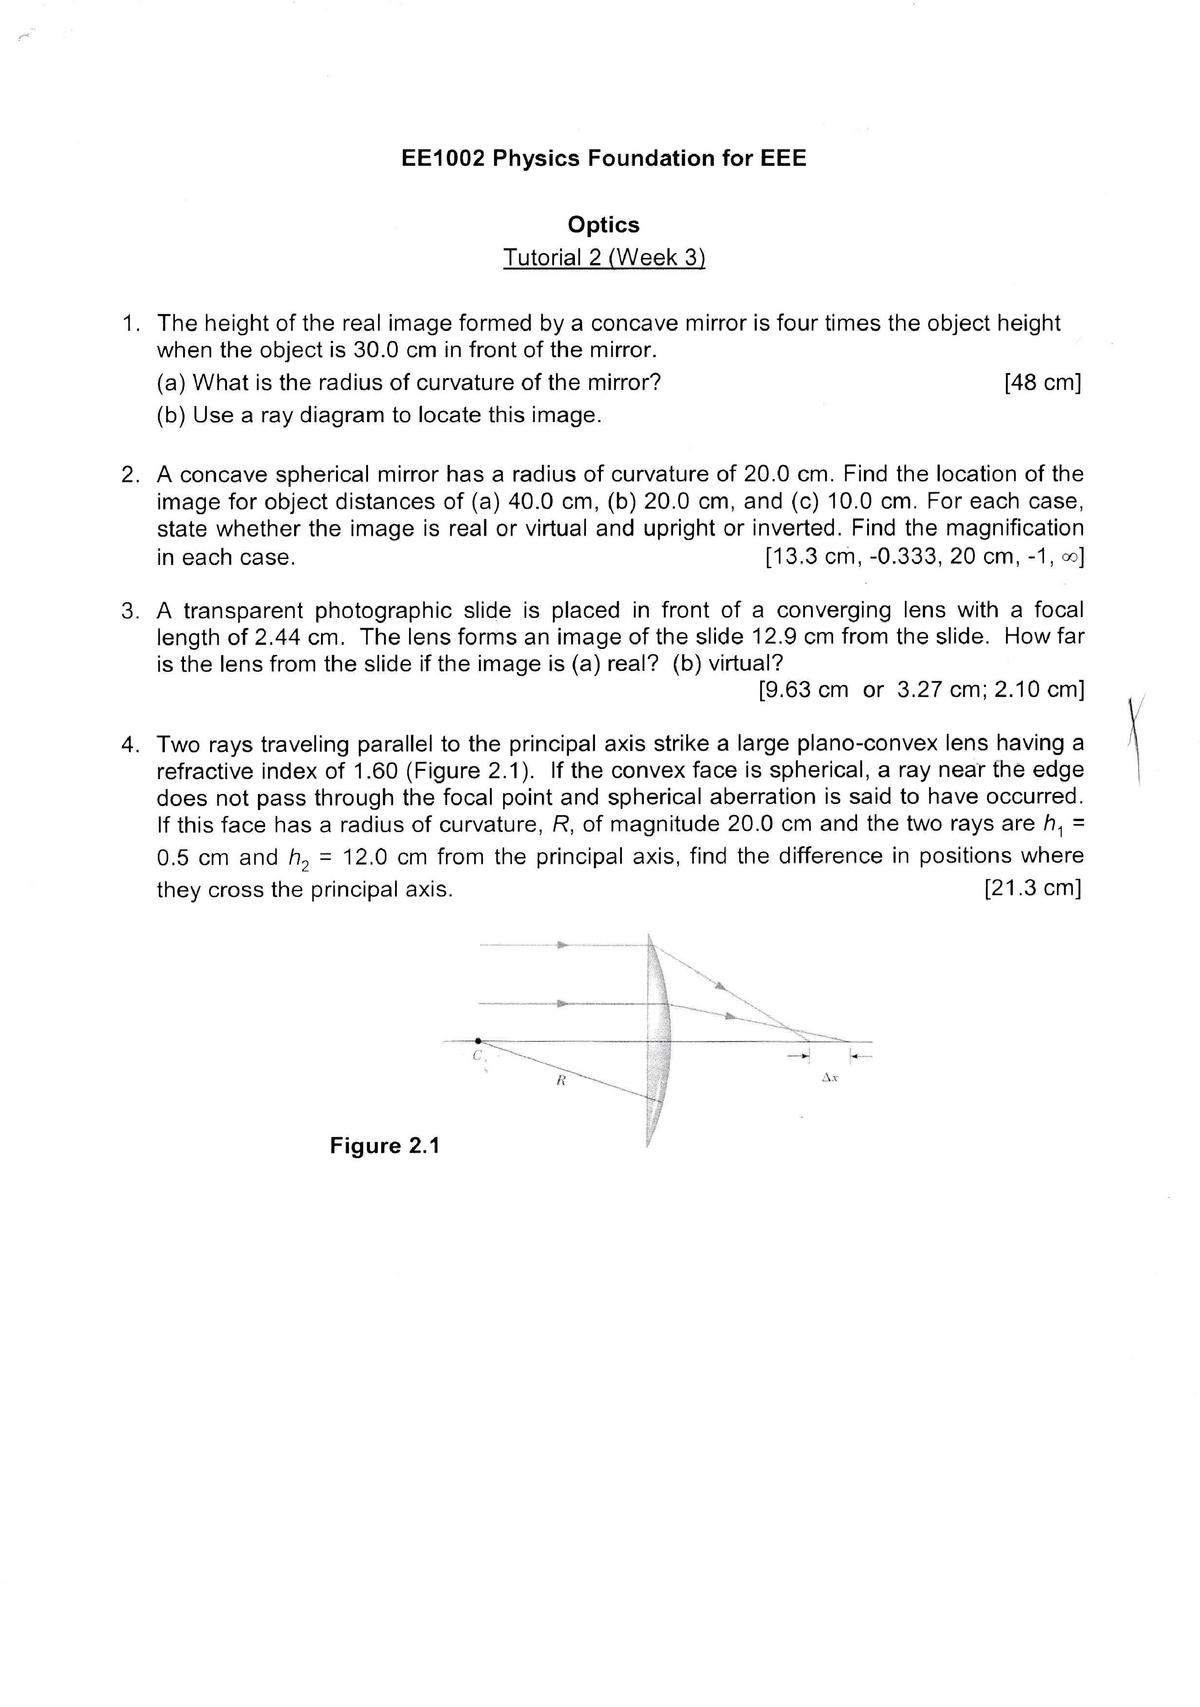 Physics Foundation Tutorial 2 Solution - EE1002: Physics Foundation